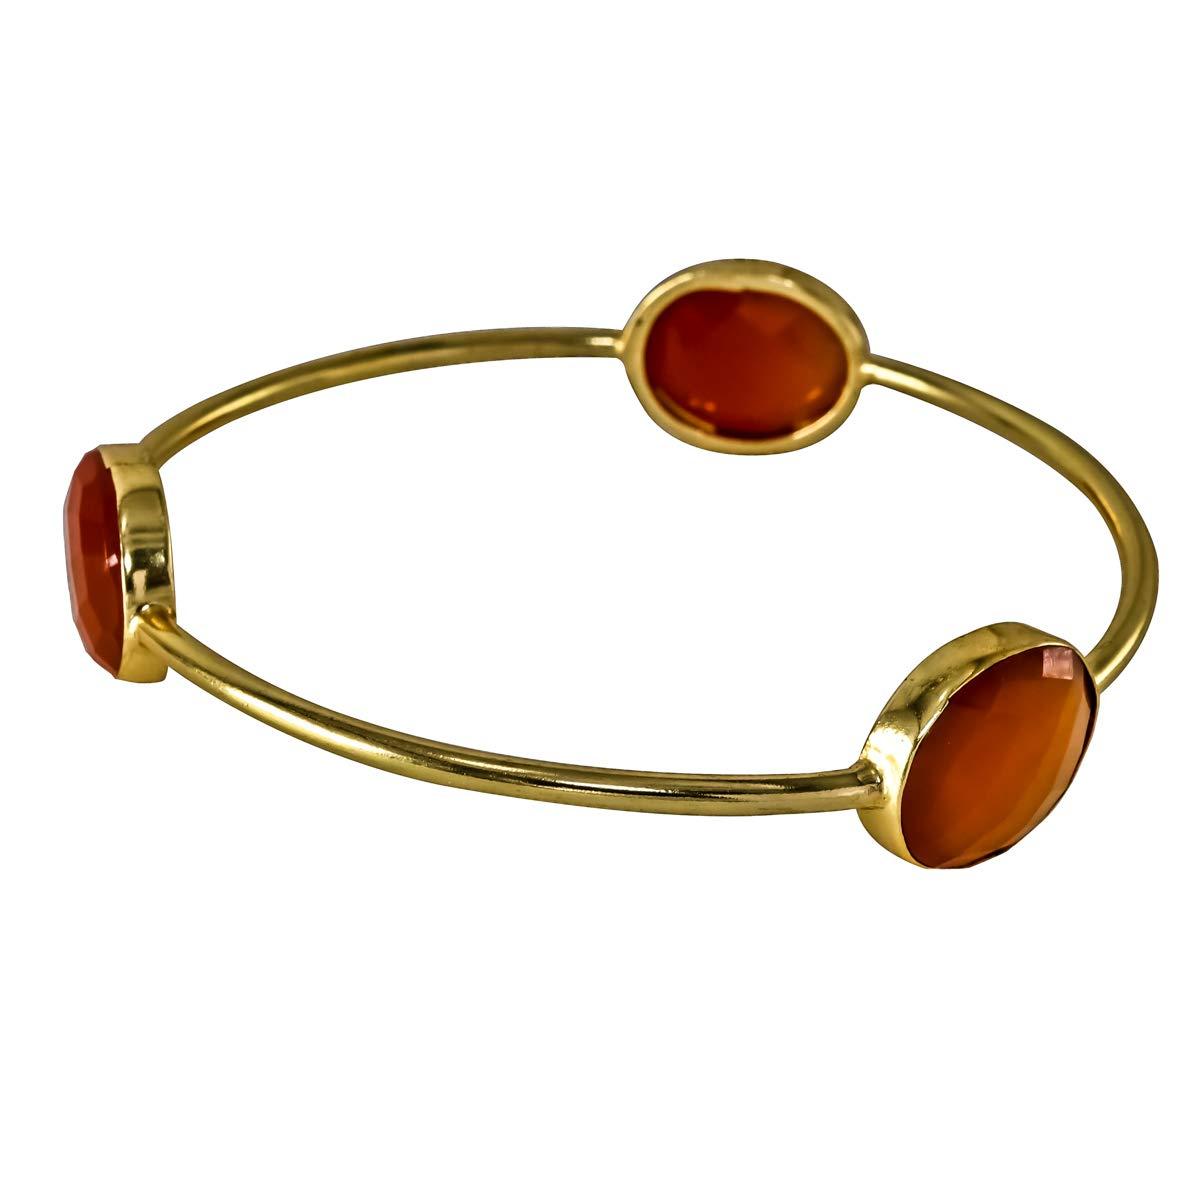 Handmade Bangles /& Bracelets Stackable, Bezel 65 Cms Carnelian 18k Gold Plated Brass